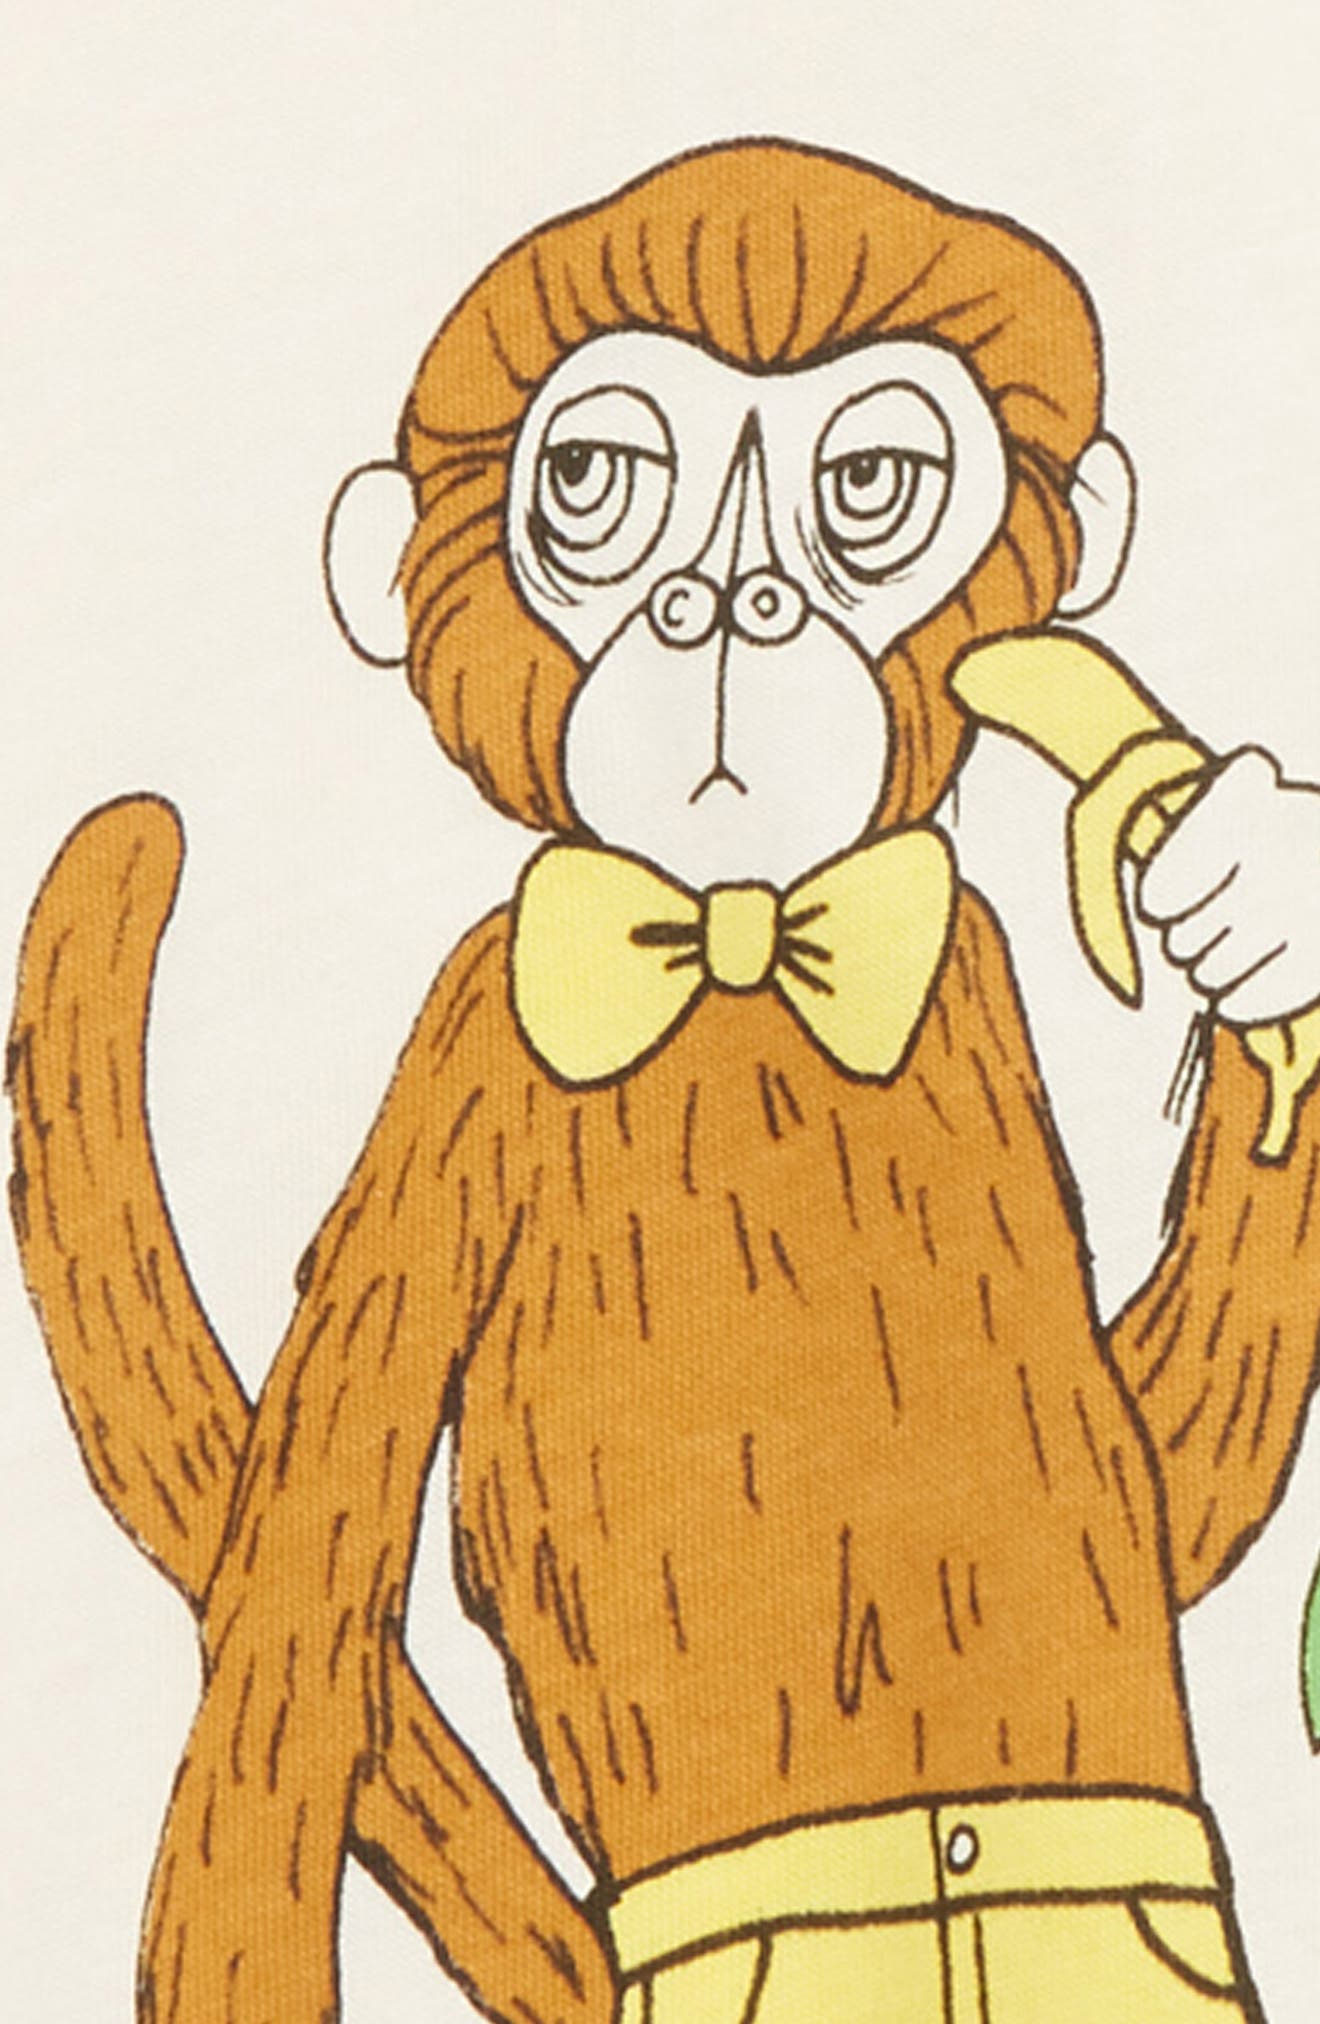 MINI RODINI,                             Cool Monkey Tee,                             Alternate thumbnail 2, color,                             OFFWHITE